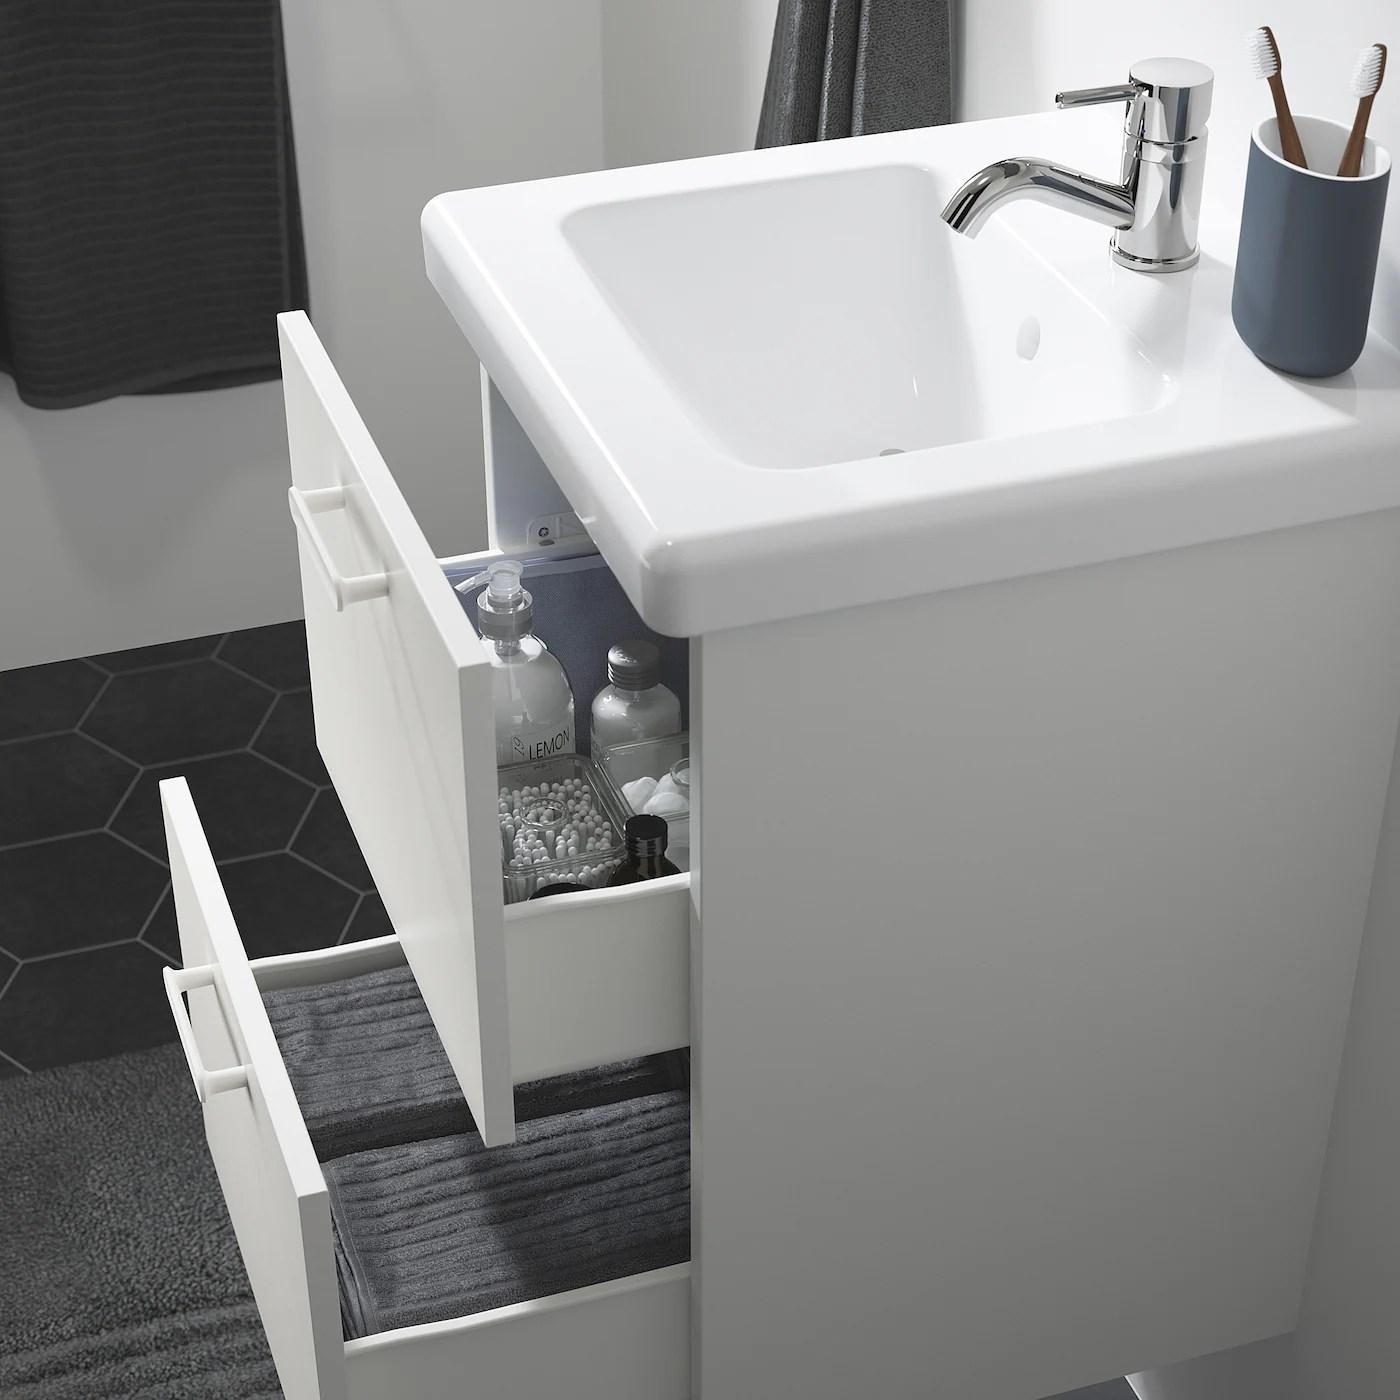 Enhet Tvallen Meuble Lavabo 2tir Blanc Pilkan Mitigeur Lavabo 44x43x65 Ikea